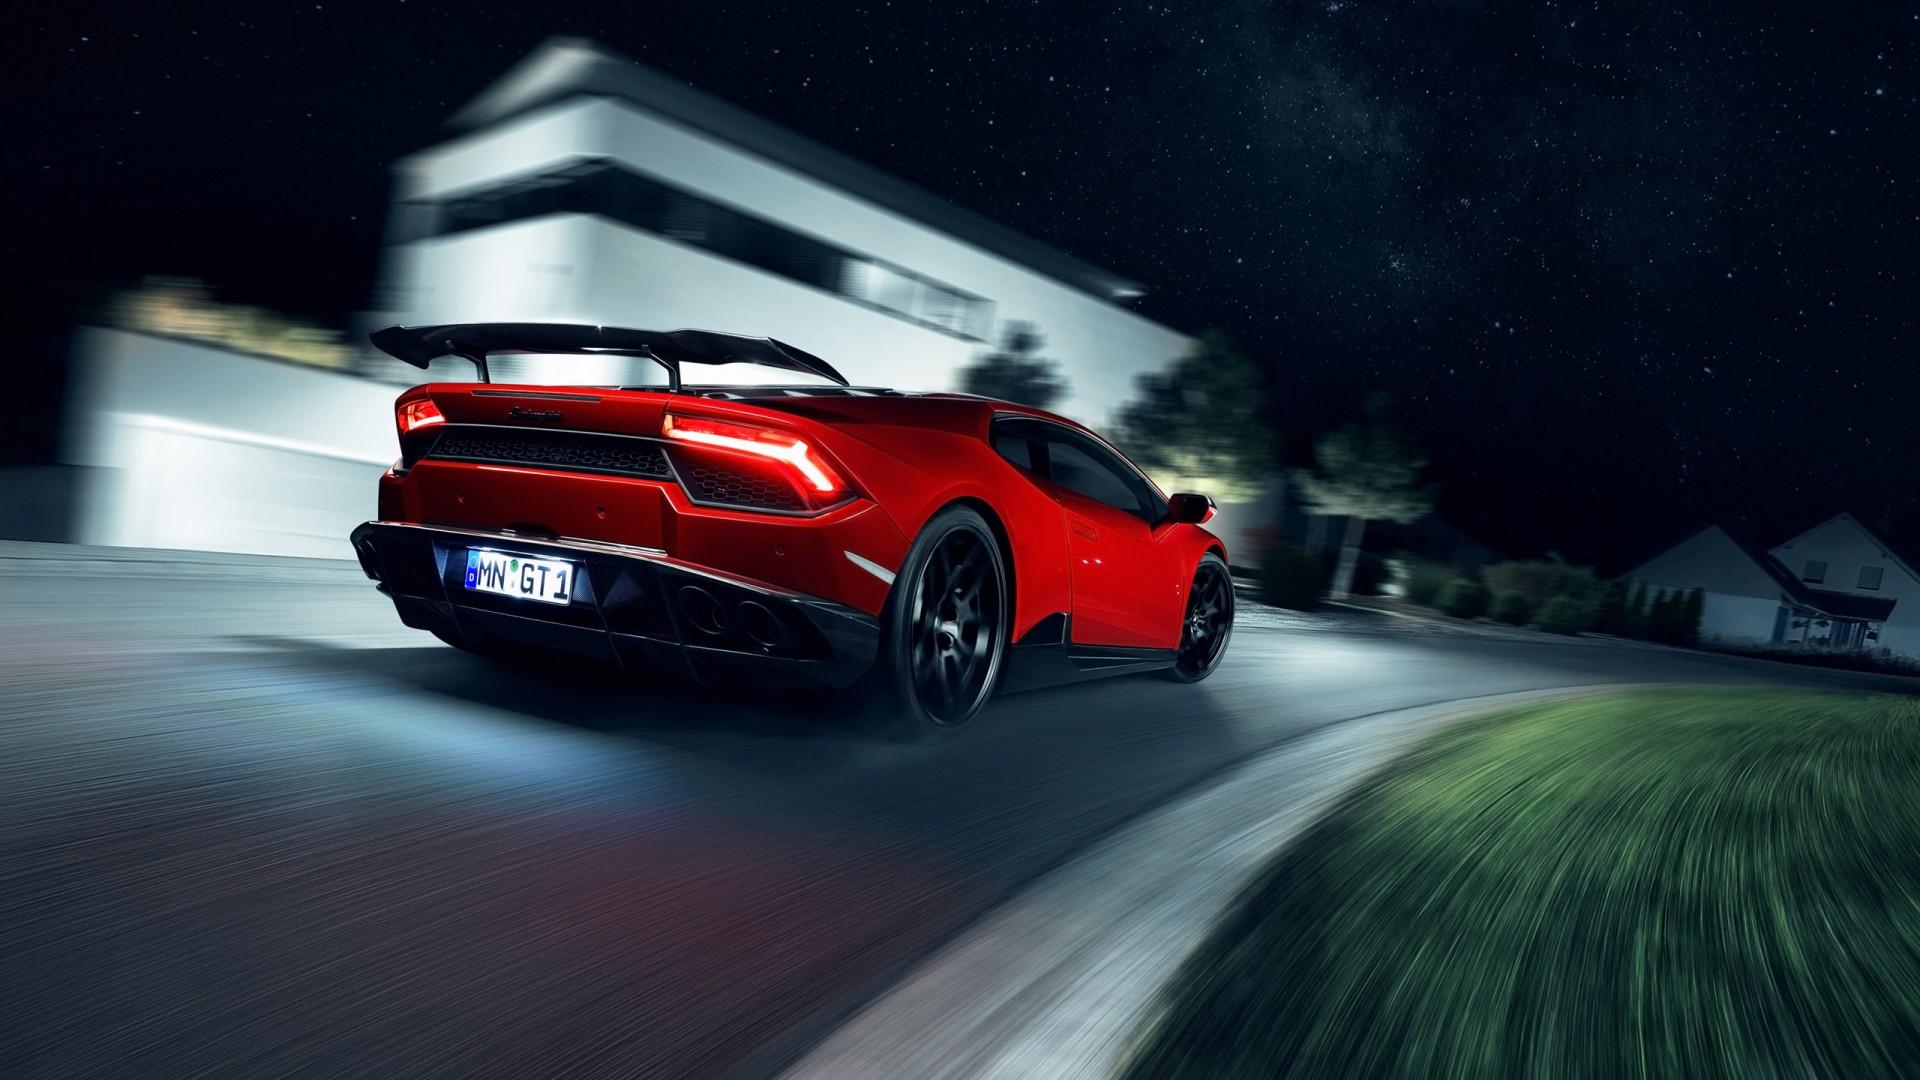 2016 Novitec Torado Lamborghini Huracan Rwd Coupe 2